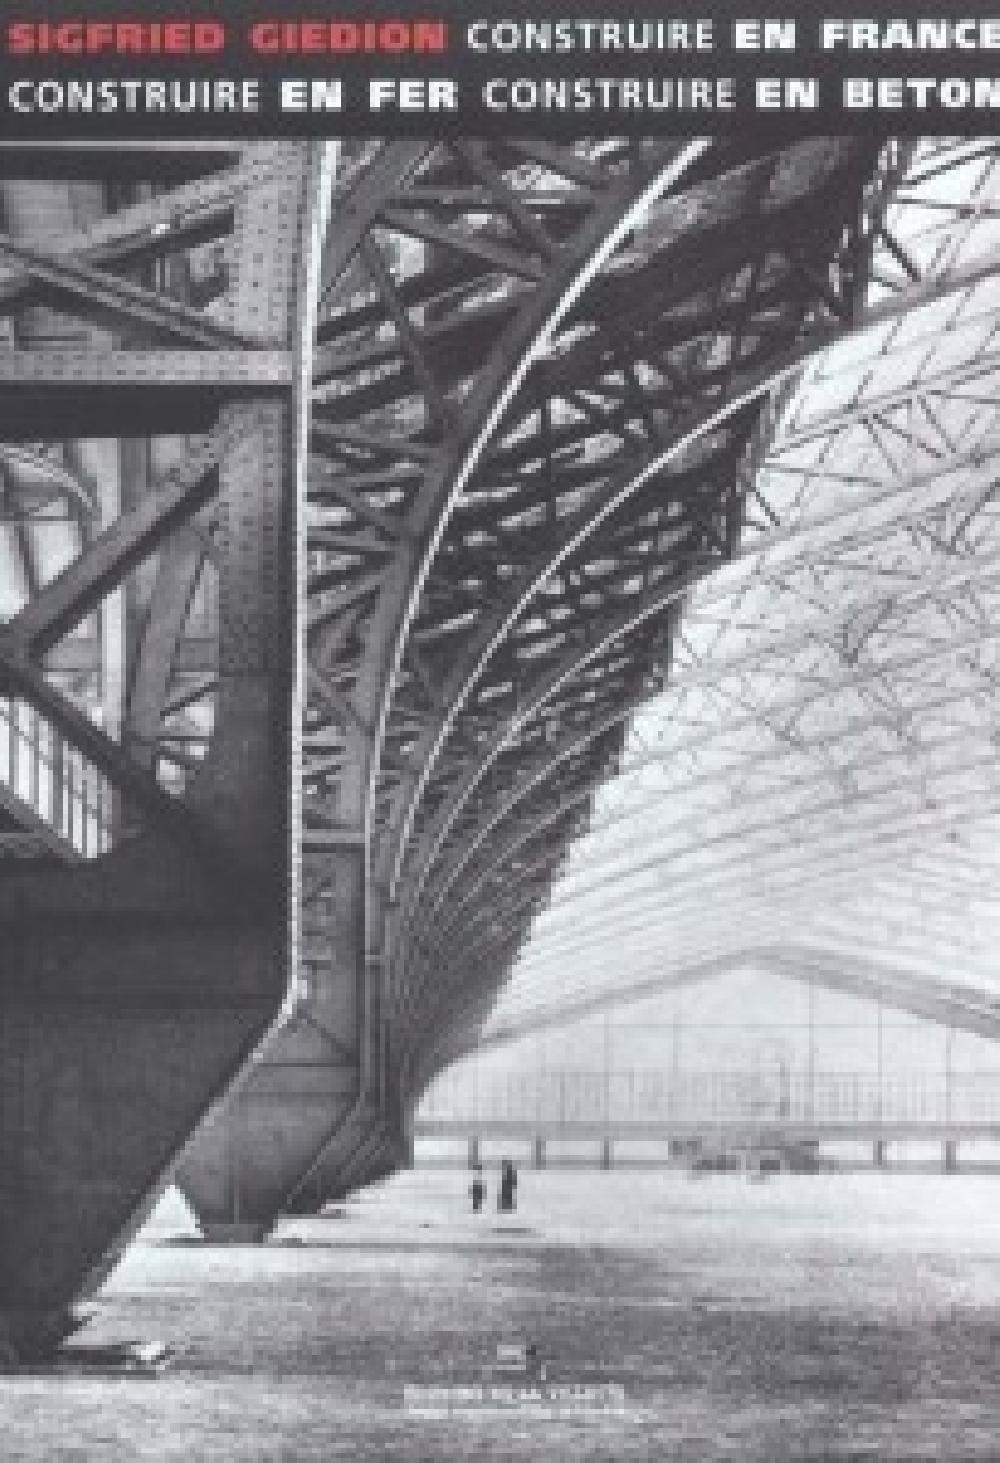 Construire en France - Construire en fer - Construire en béton